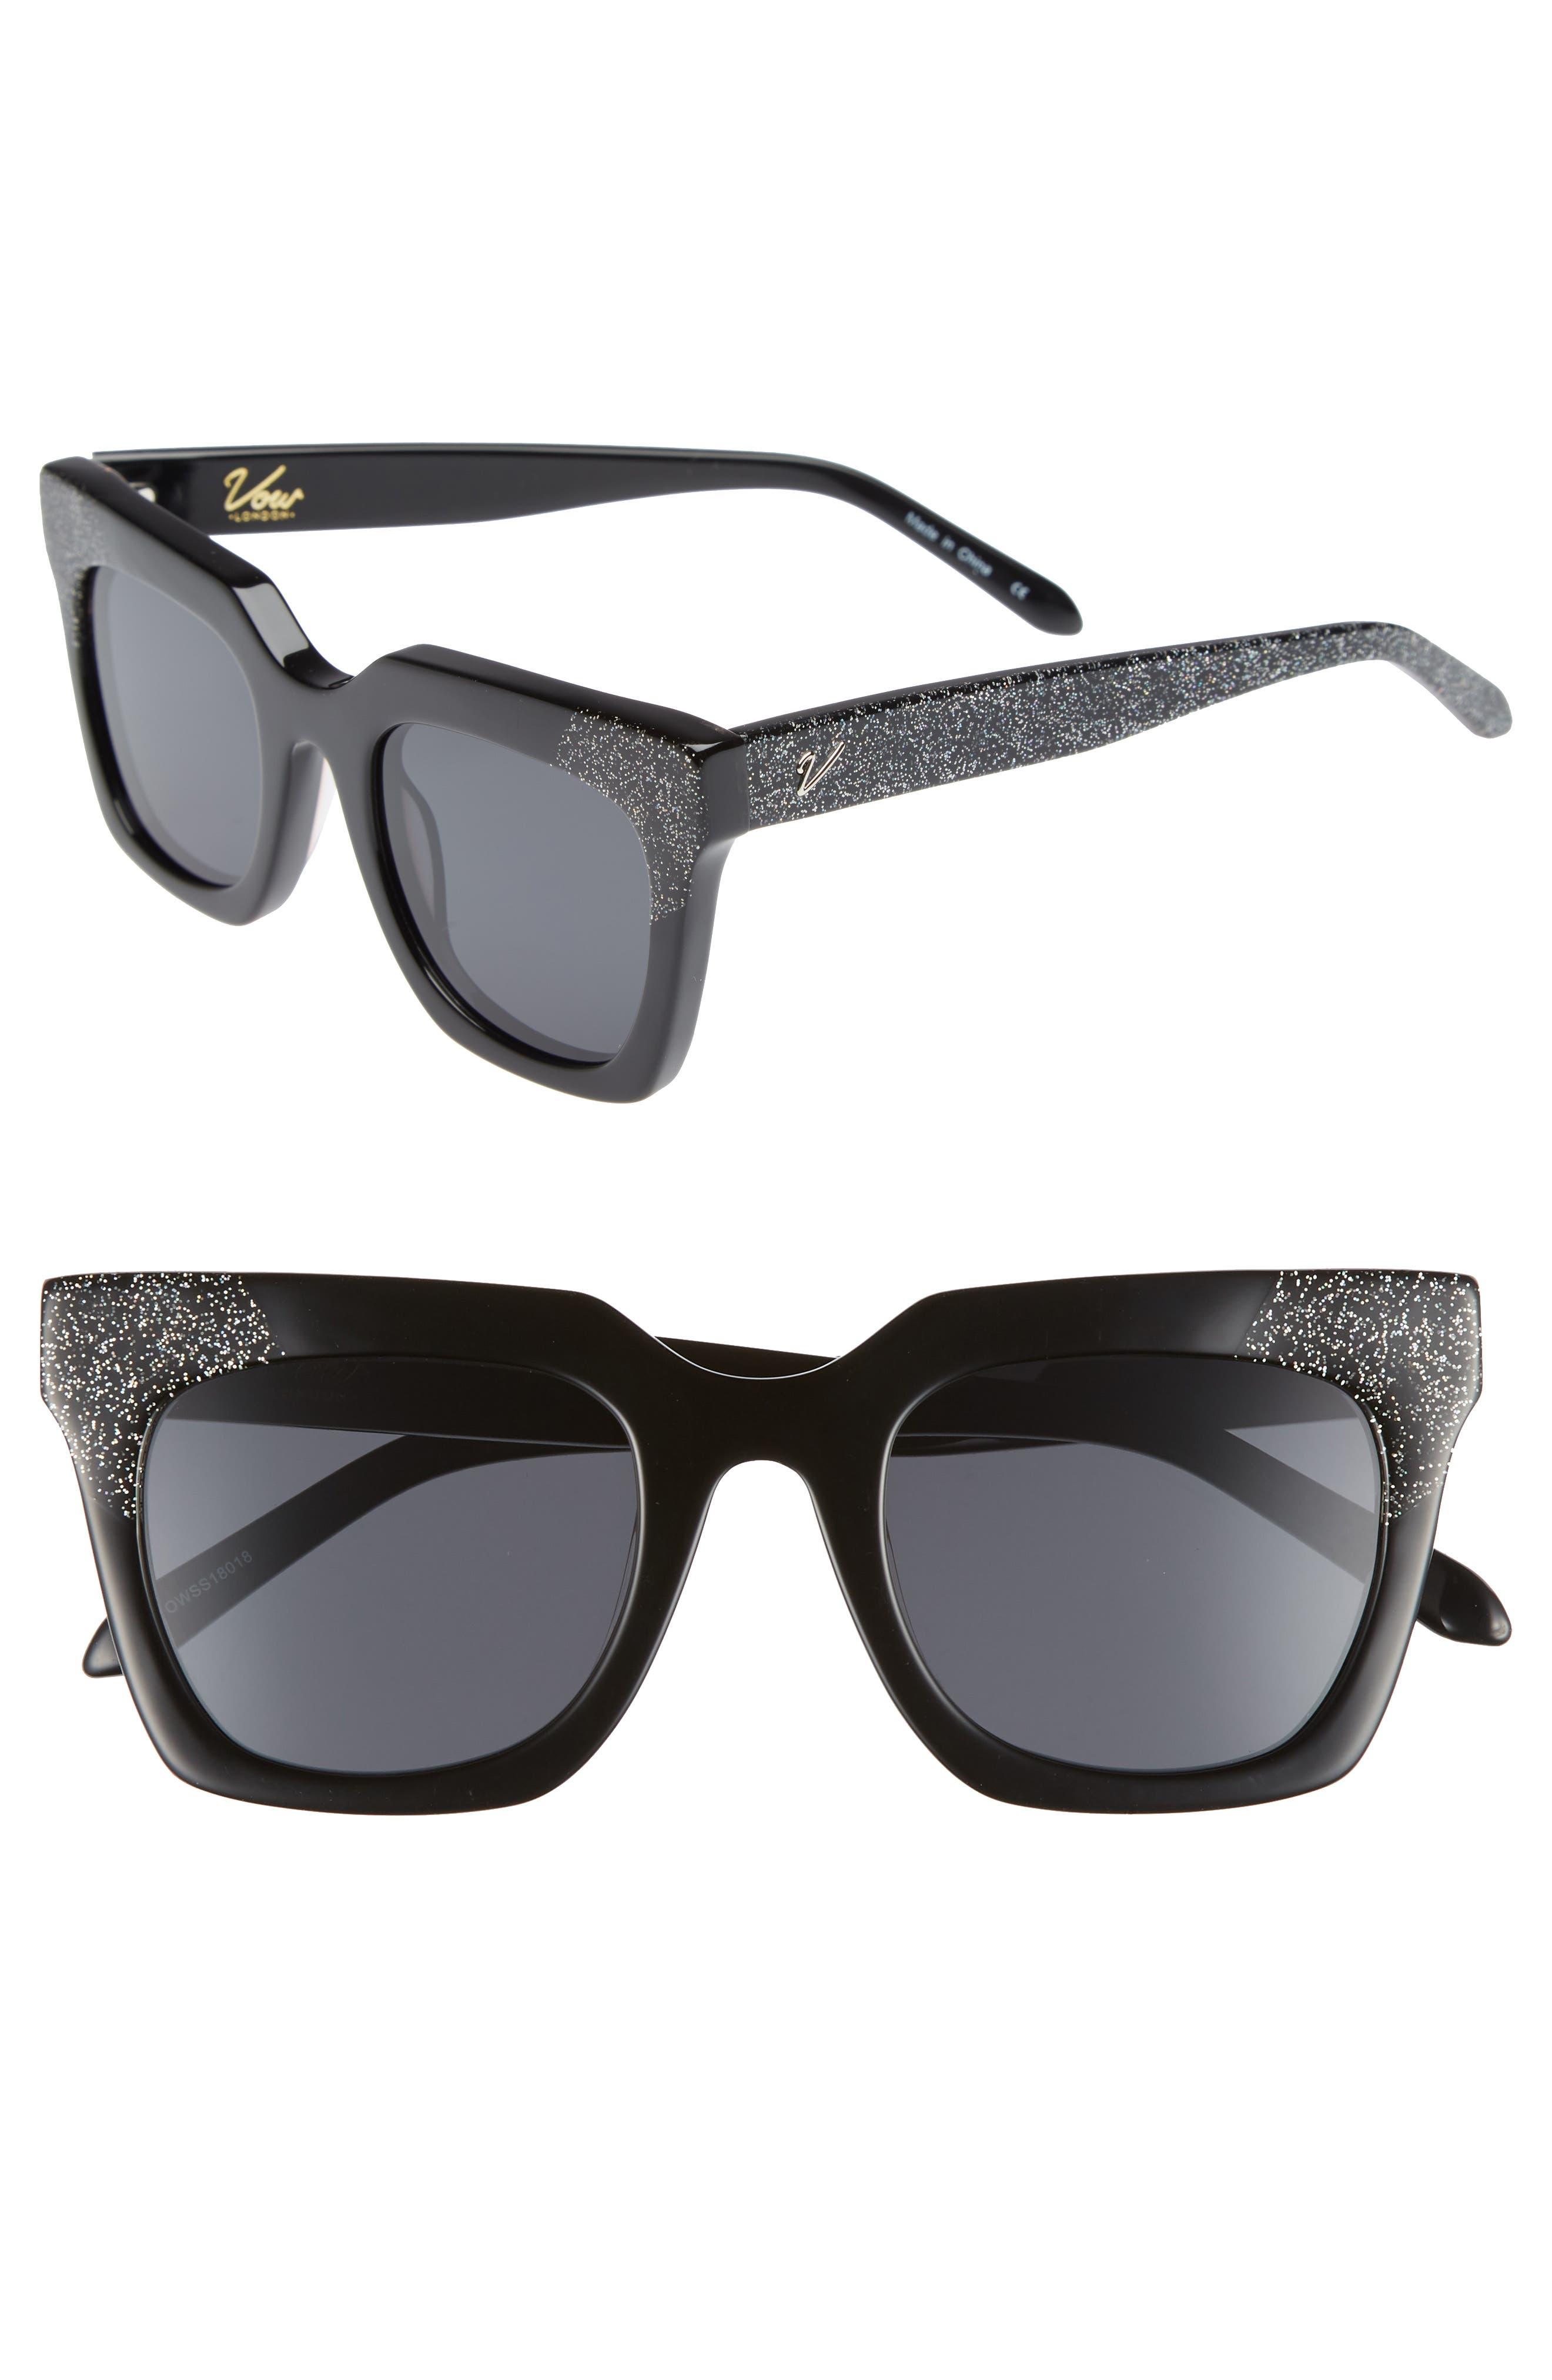 Riley 50mm Cat Eye Sunglasses,                         Main,                         color, BLACK/ SMOKE